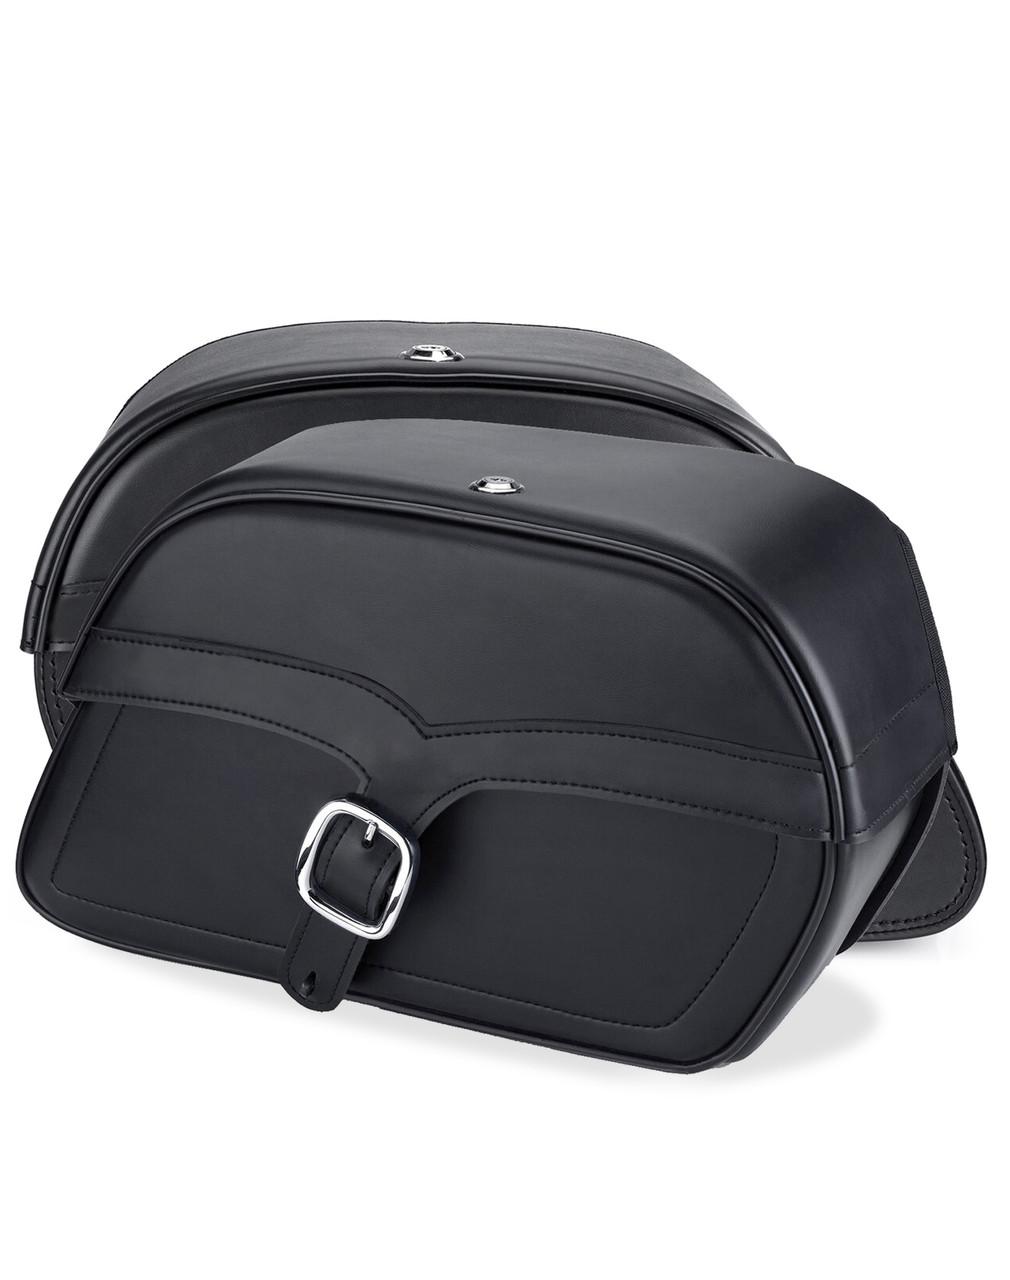 Honda Rebel 500 Single Strap Shock Cutout Slanted Large Motorcycle Saddlebags Both Bags View